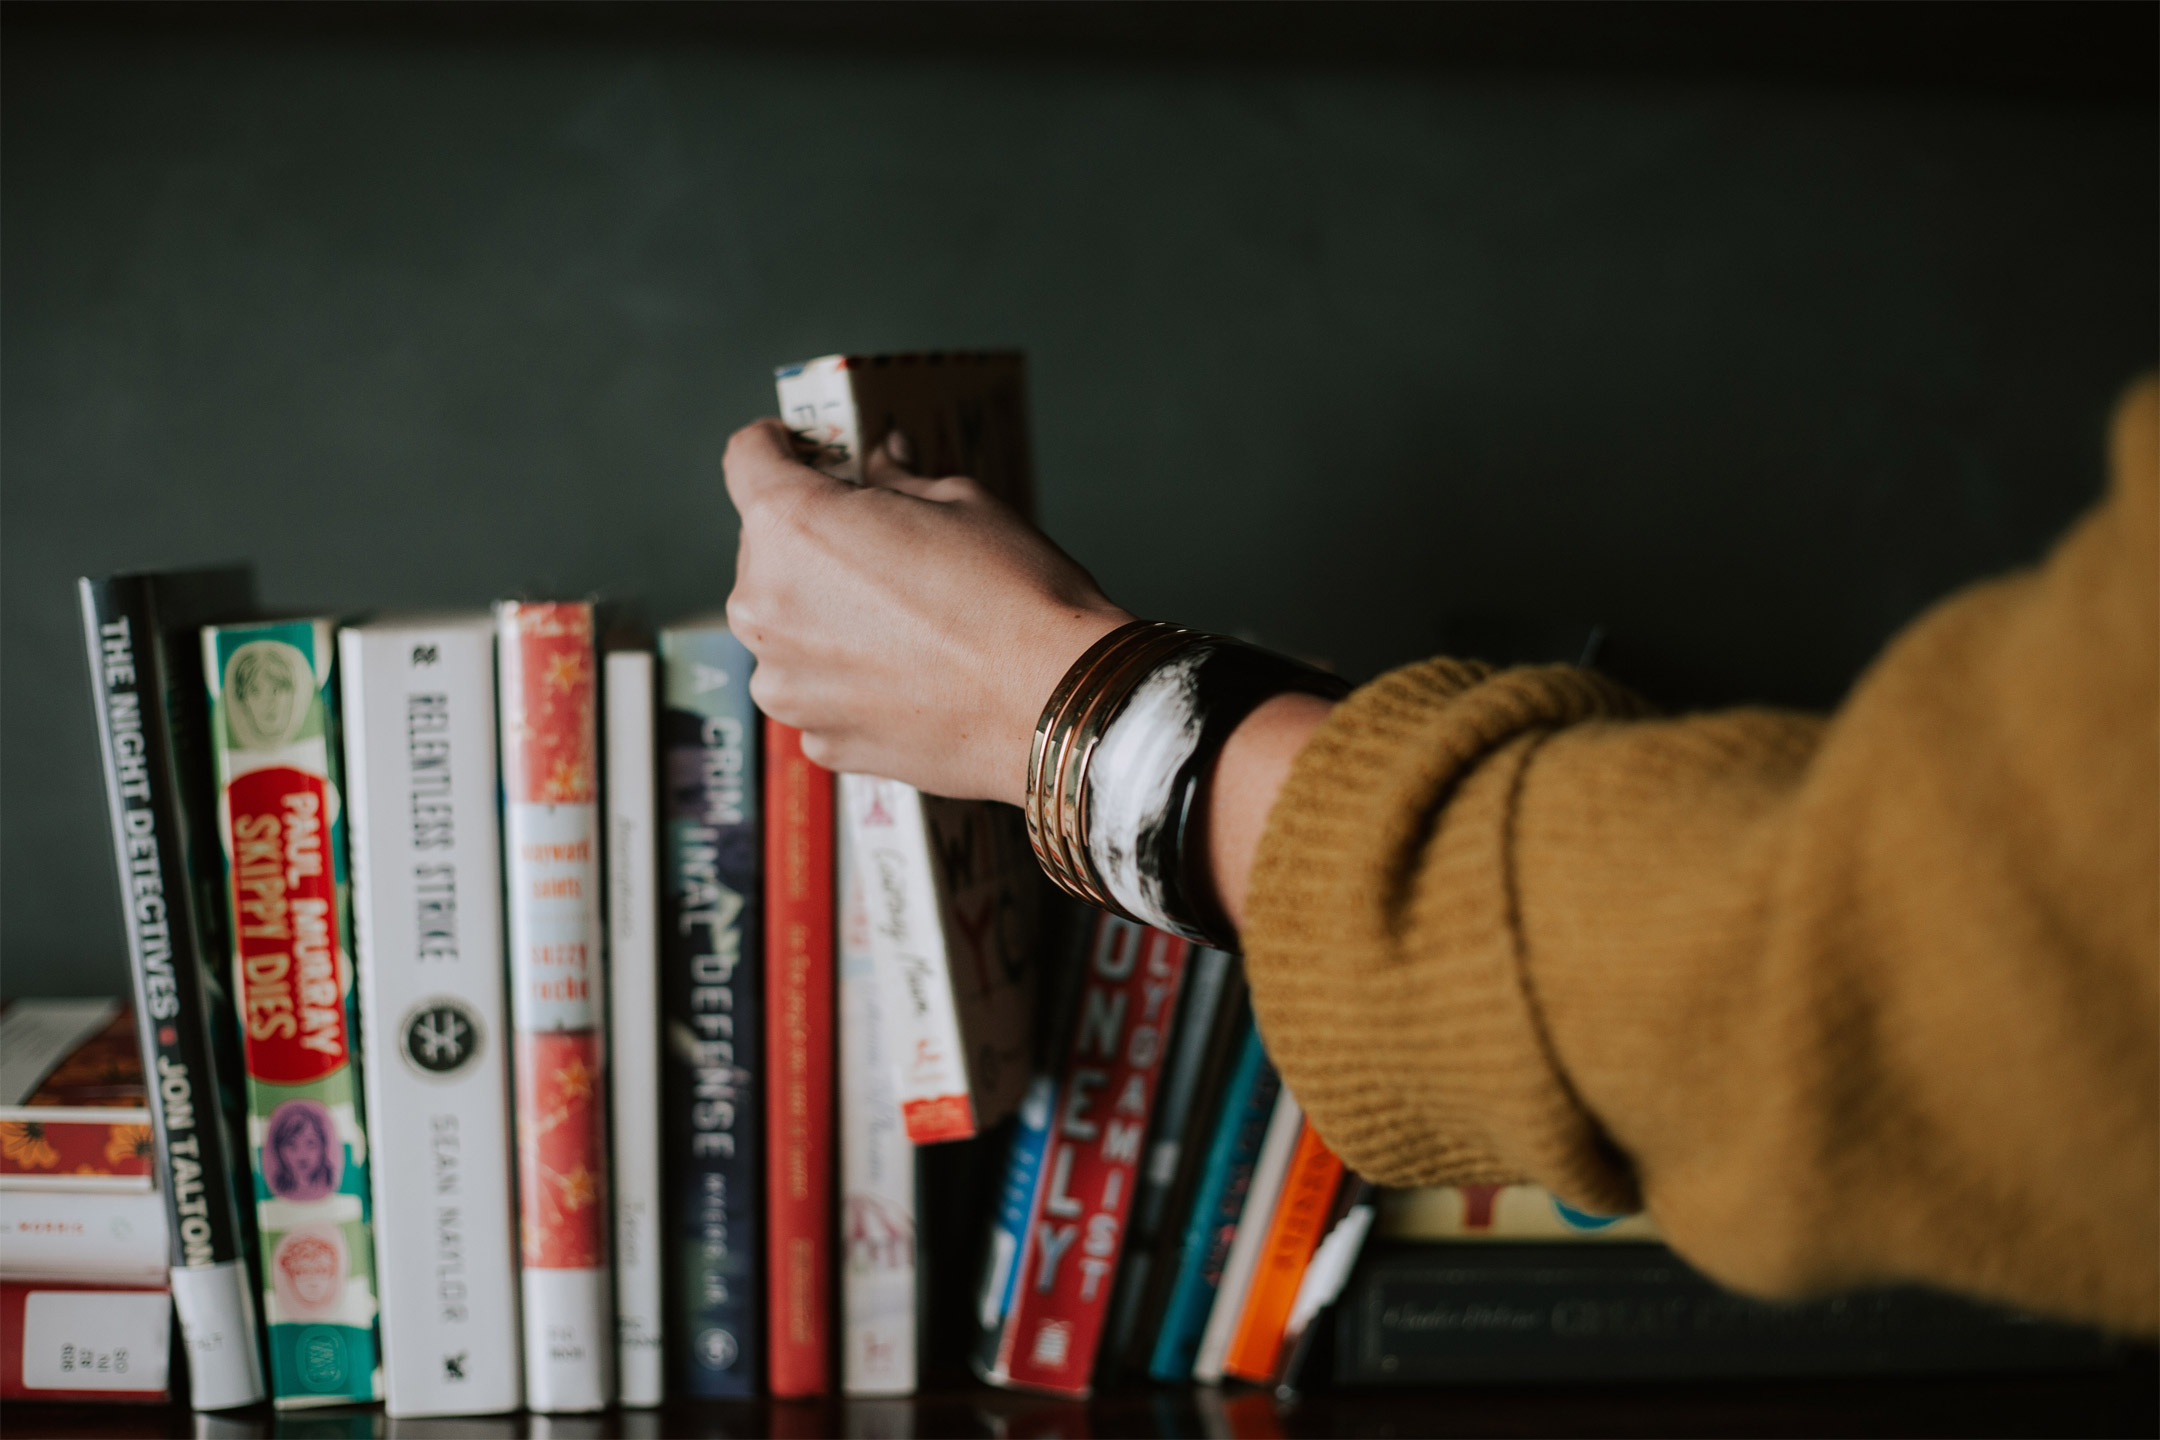 female-arm-reaching-for-book2160